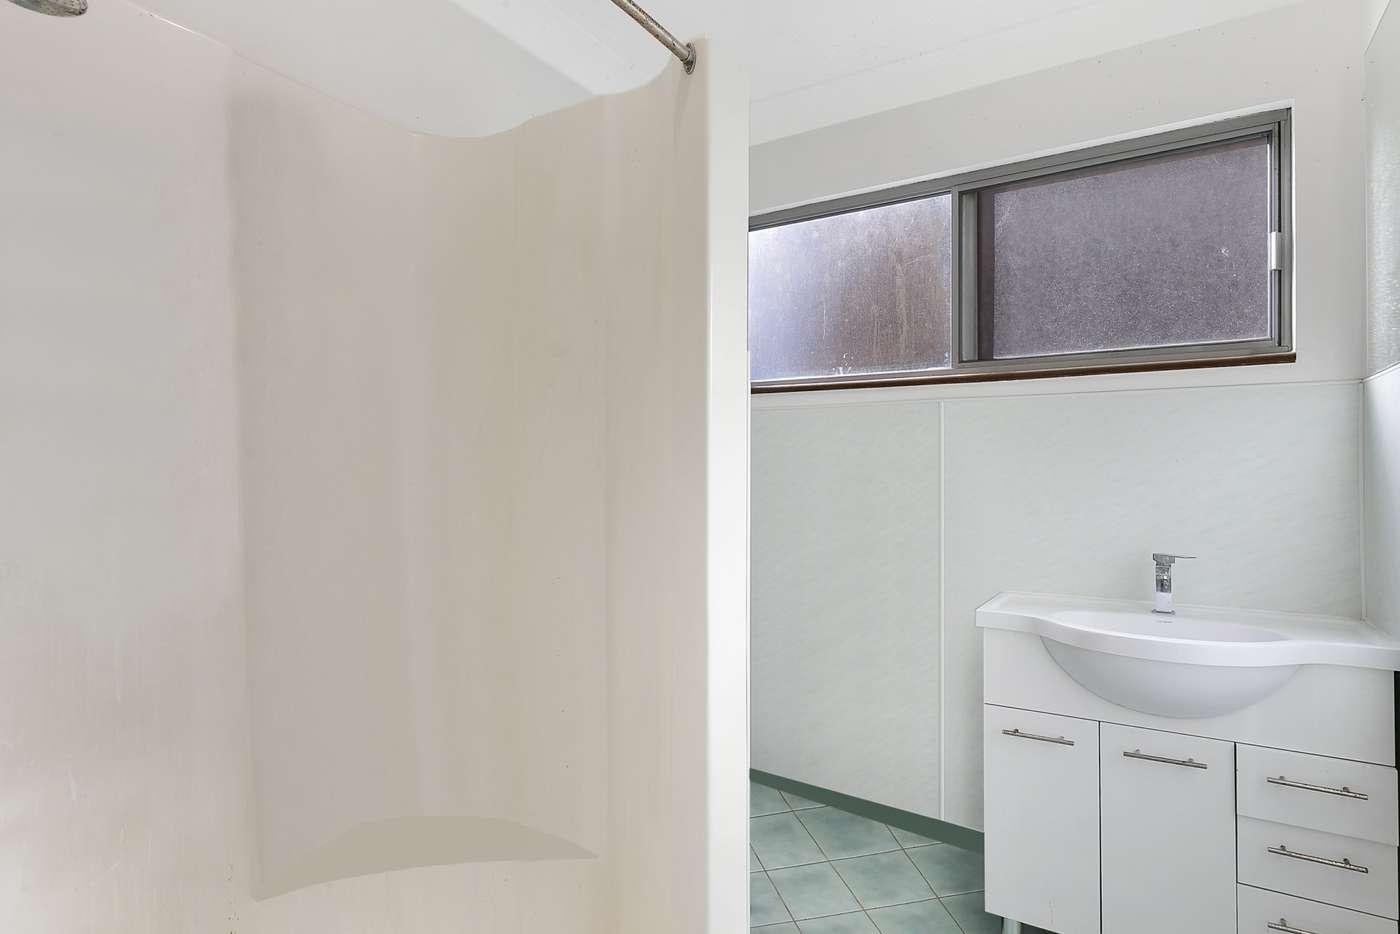 Sixth view of Homely house listing, 12 Harding Avenue, Lake Munmorah NSW 2259